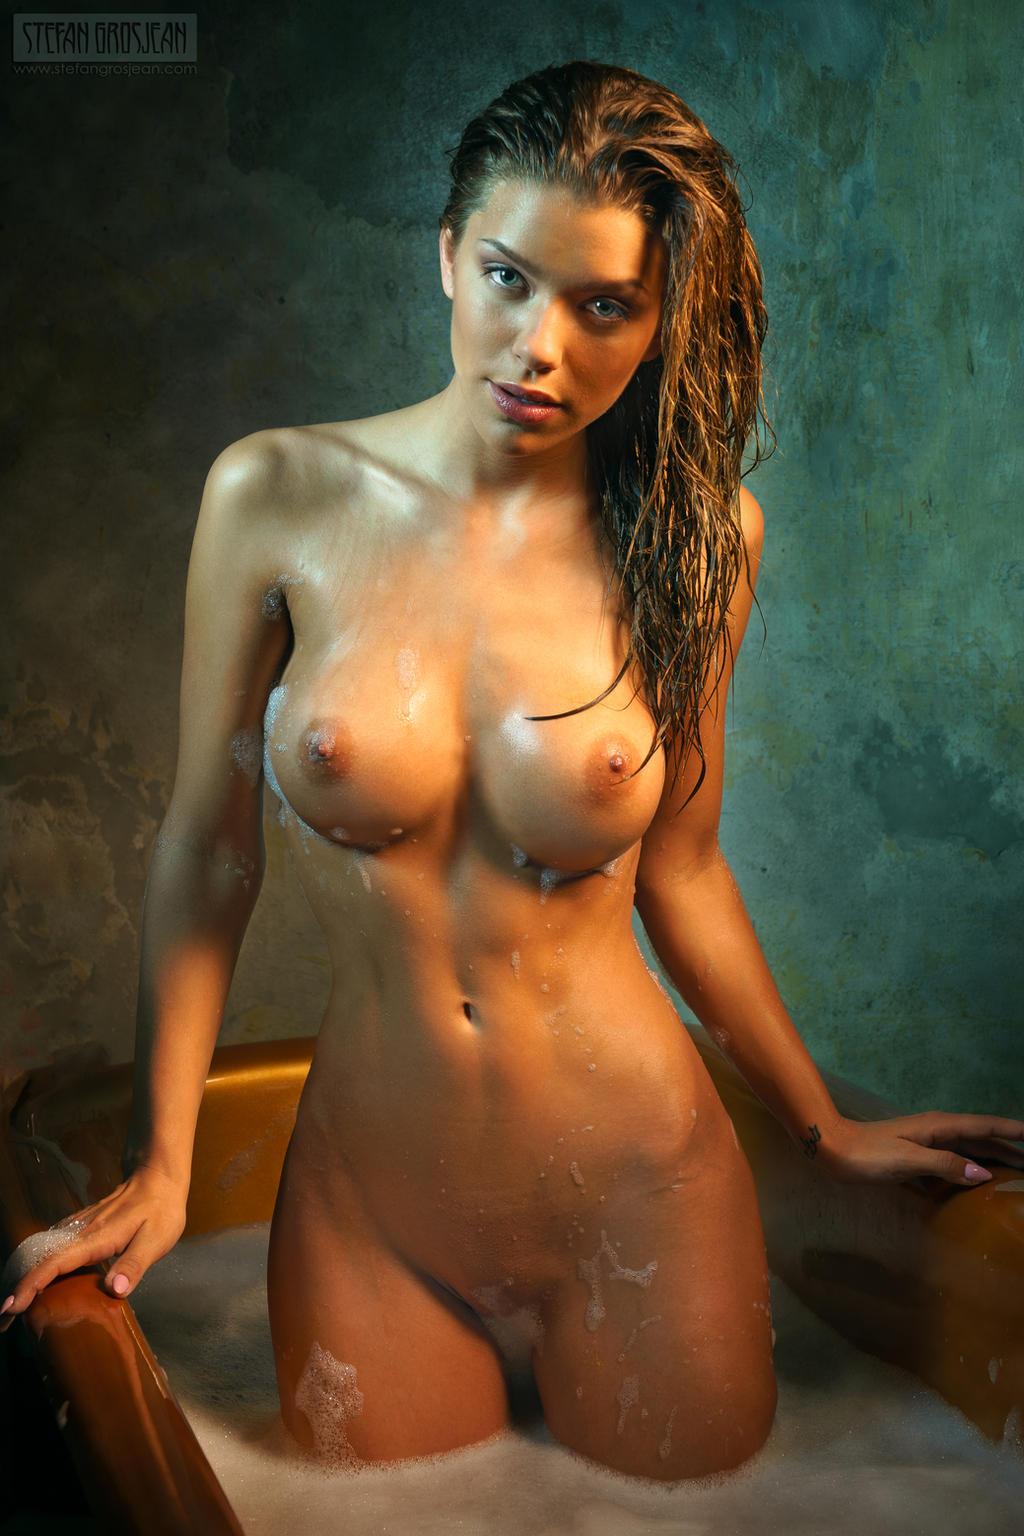 Nude hot women fucks images